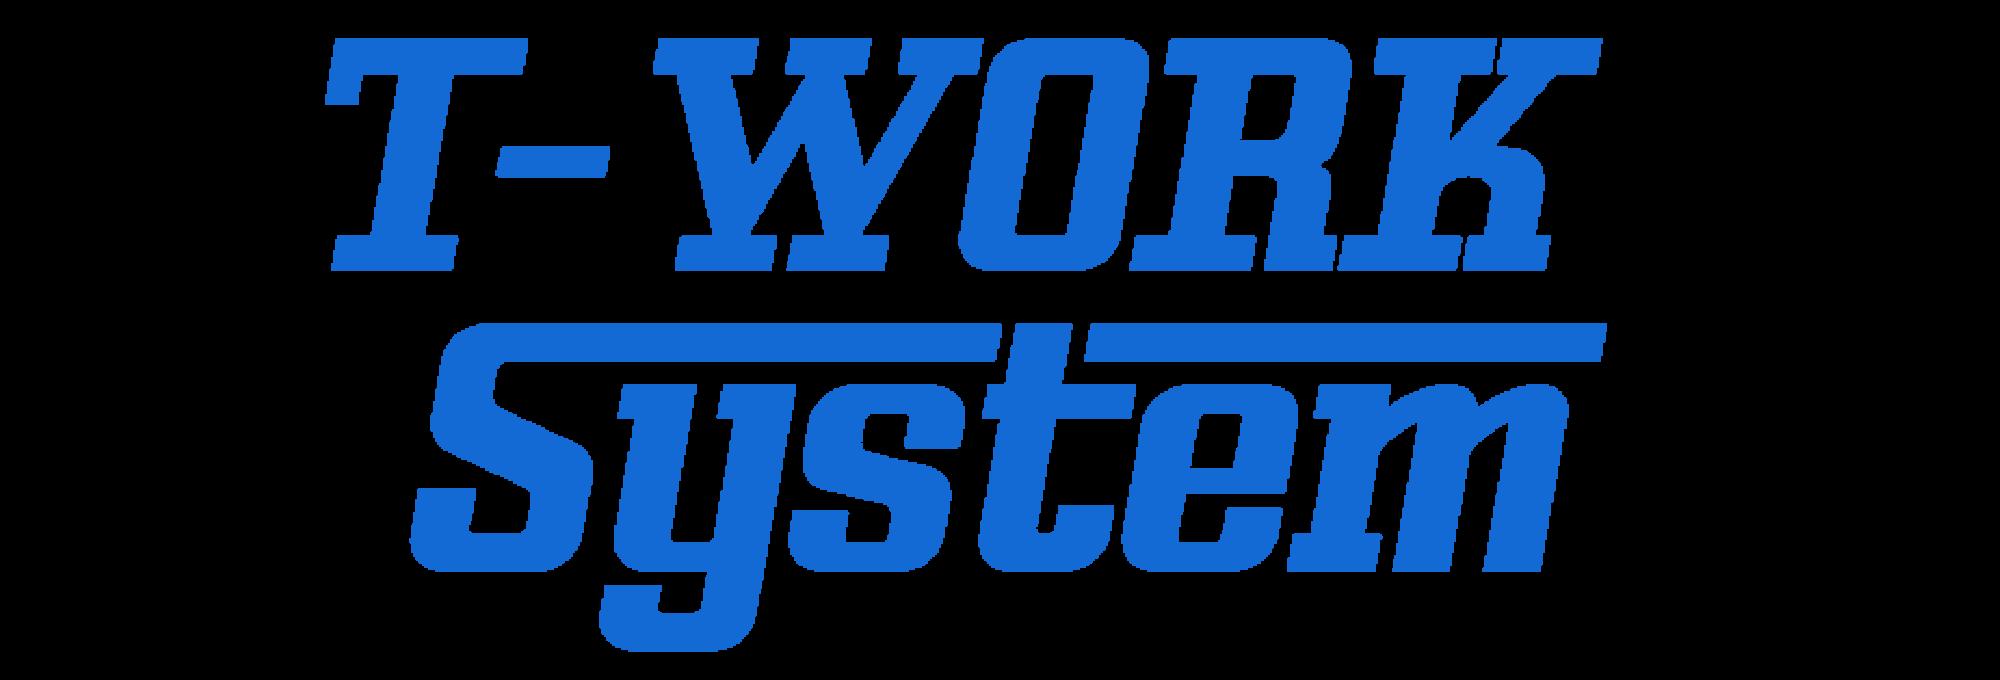 t-work-system-logo-mobile